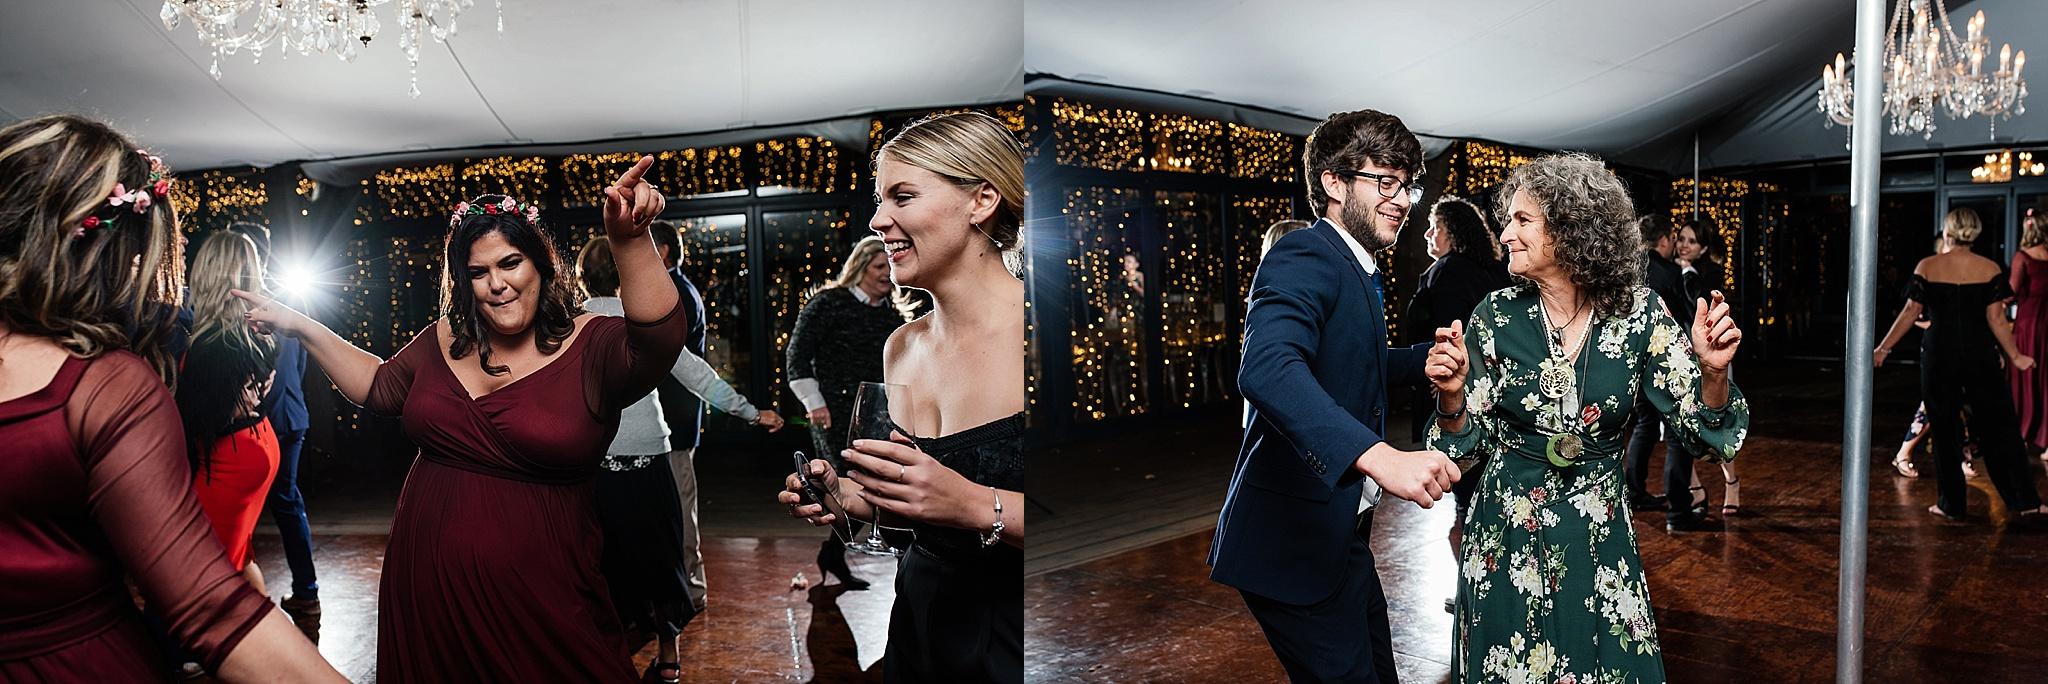 Cape Town Photographer Darren Bester - Die Woud Wedding - Gareth & Roxanne_0061.jpg